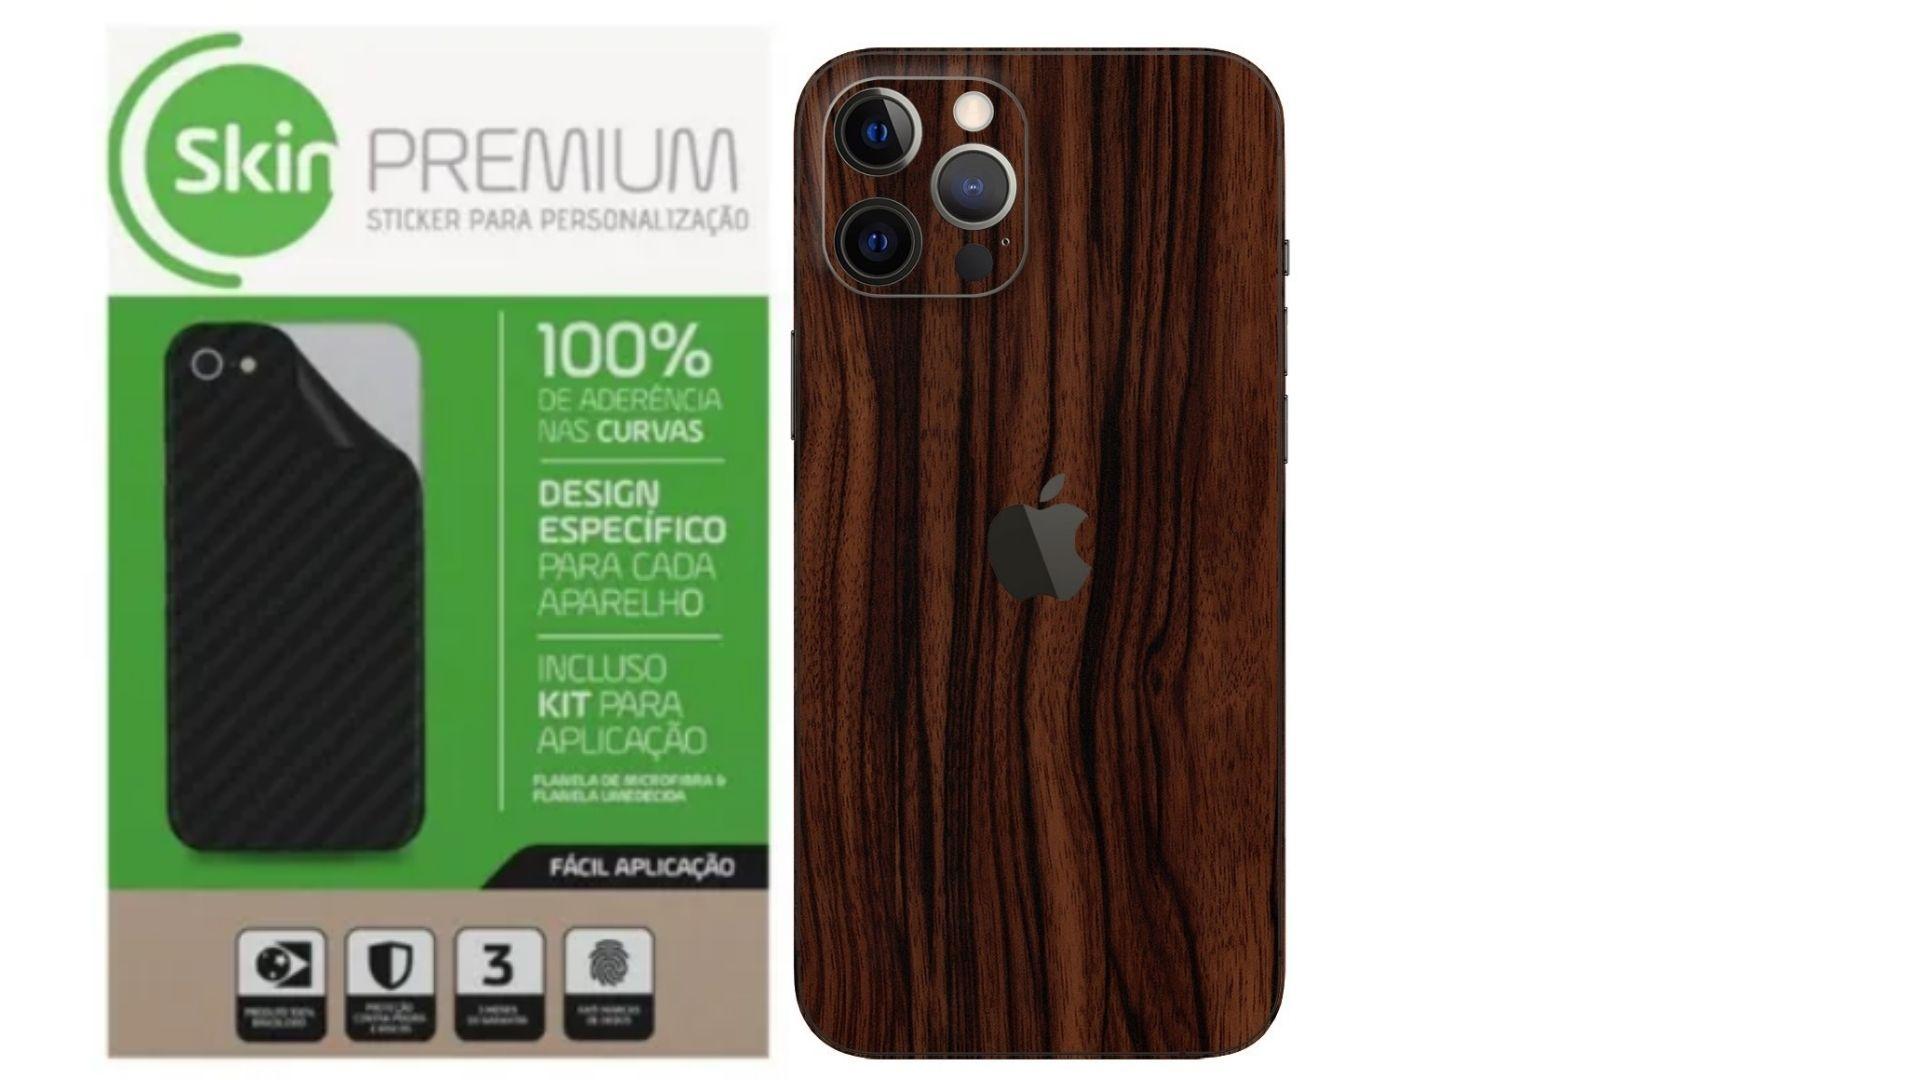 Skin Premium Verso e Laterais Estampa de Madeira para Iphone 12 Pro Max